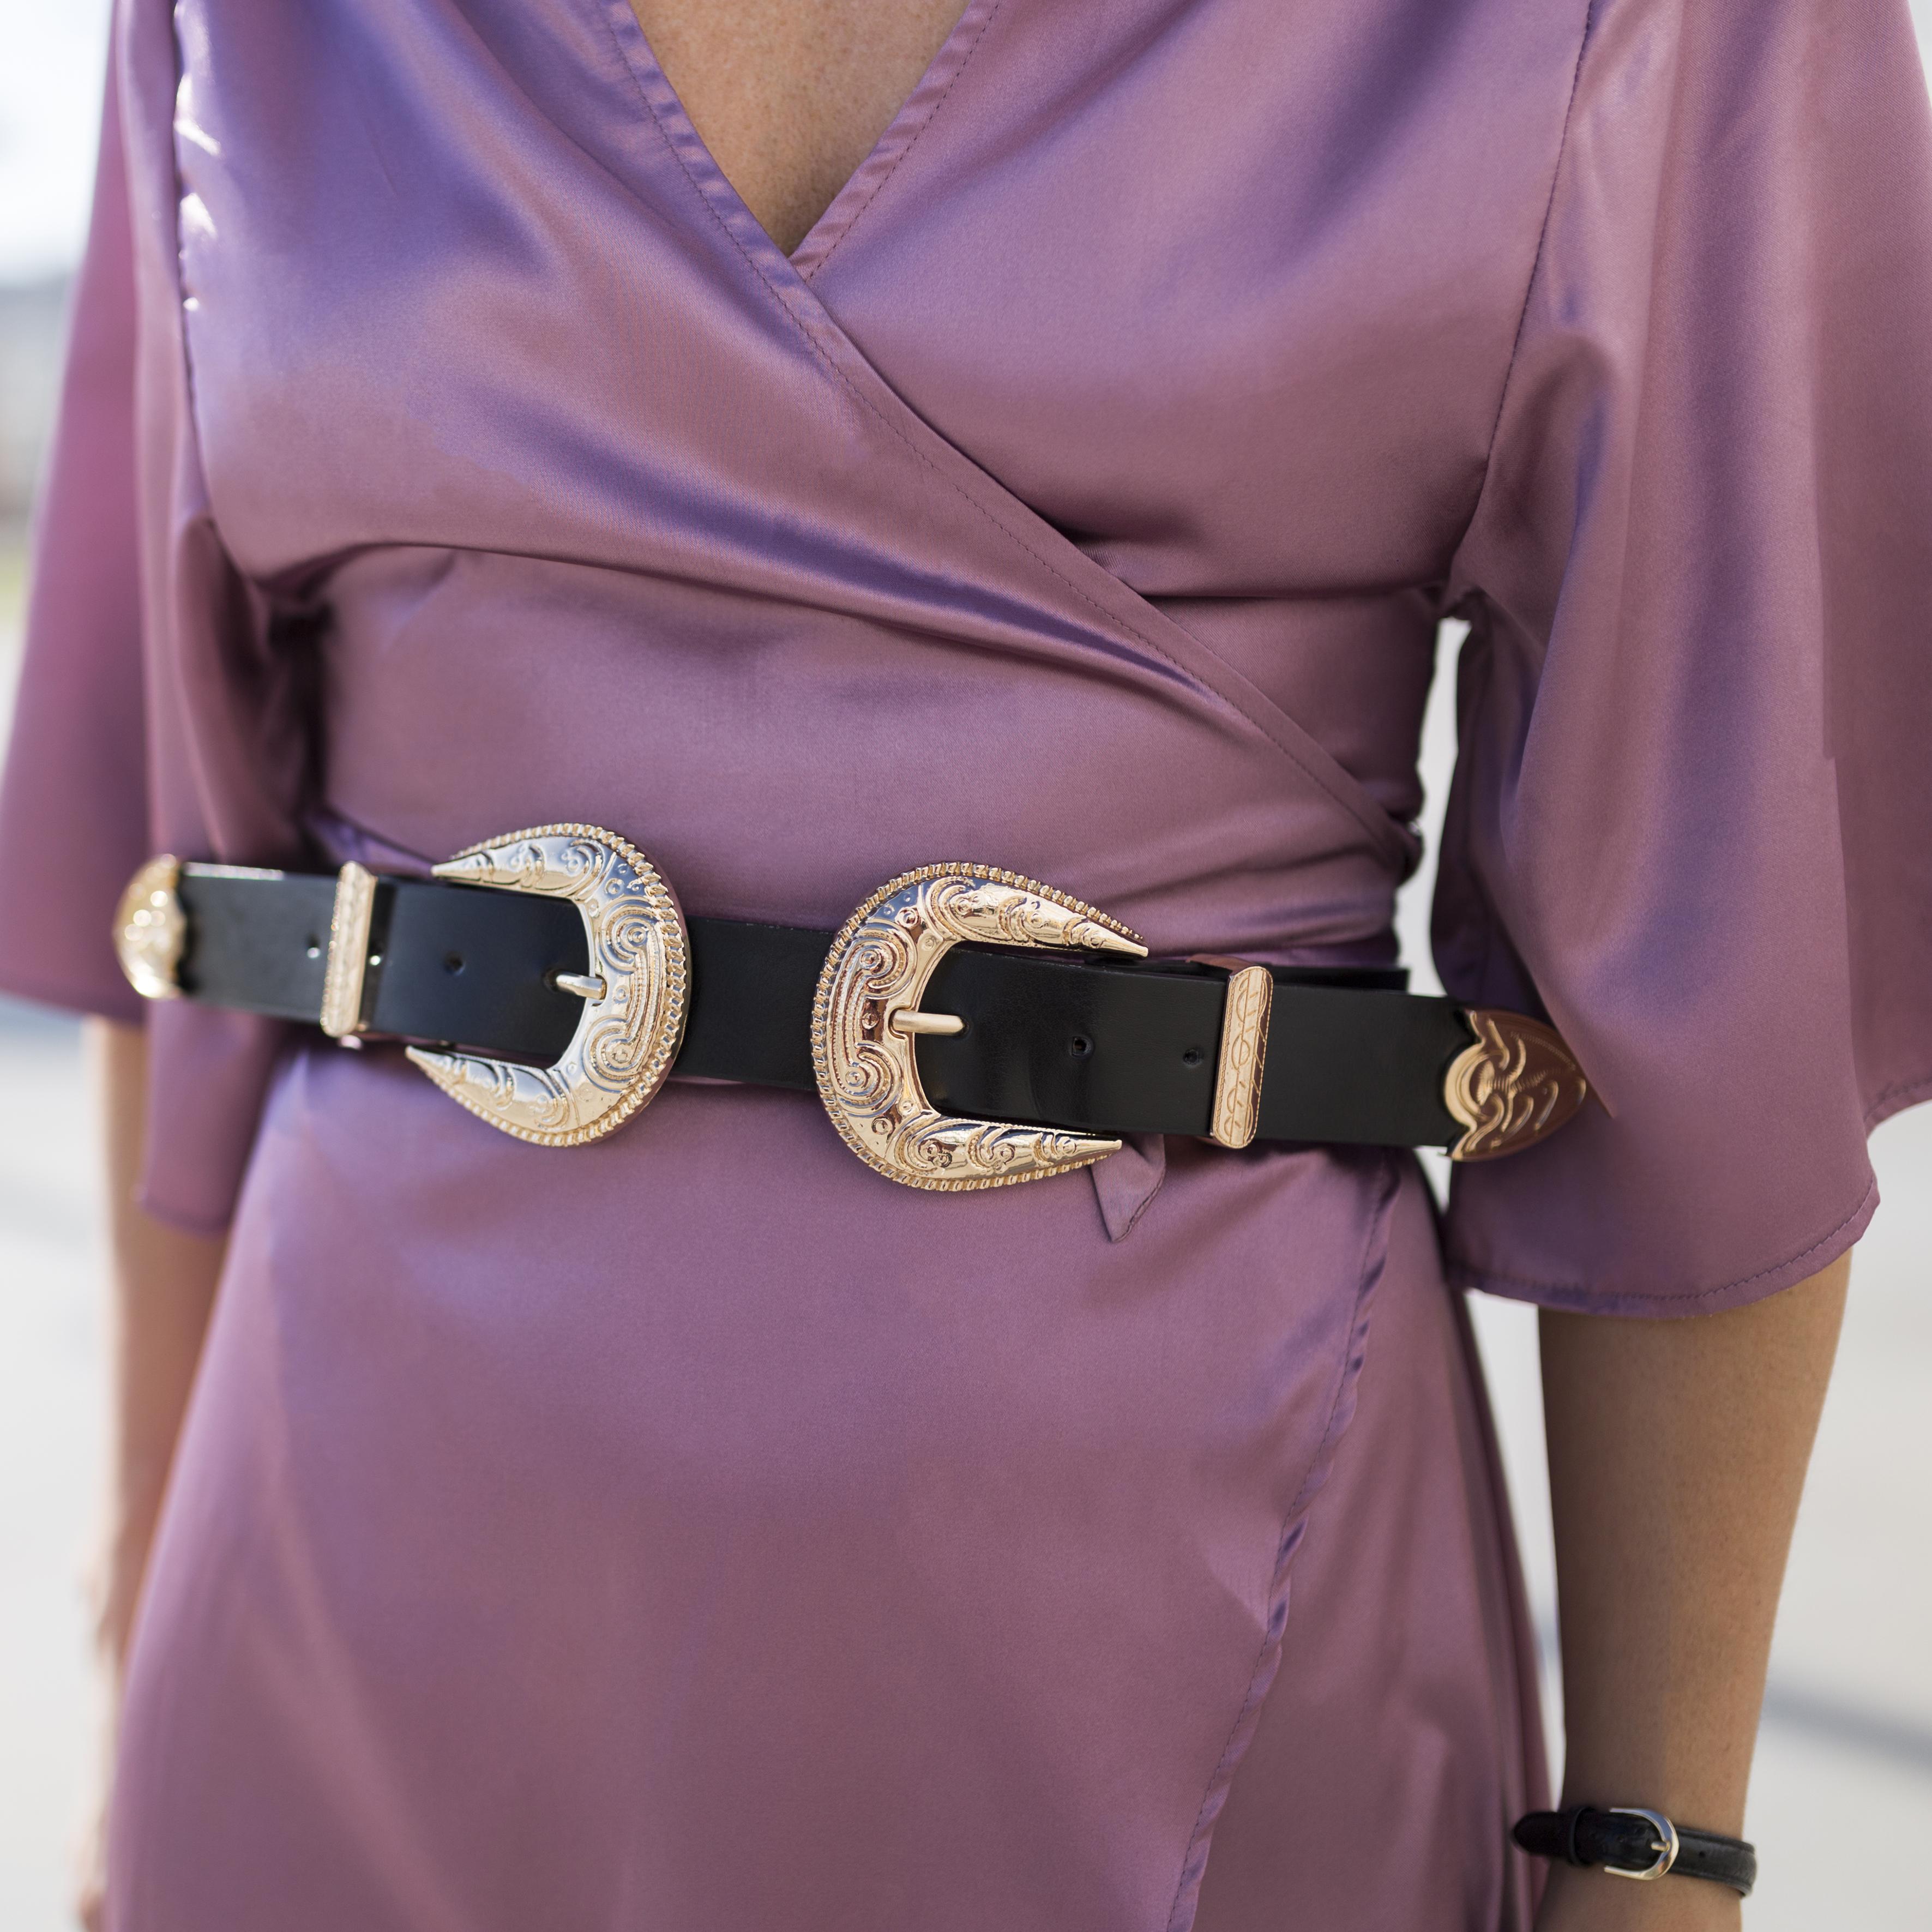 shein belt- cinturon doble hebilla-StyleLovely-blogger- alba cuesta- vestido satinado - descalzaporelparque-choker zara - SHEIN - ootd - galicia - fashion -blogger - style - moda calle - streetstyle - denia priegue - video - Shein dress - chanel - vintage - botines - zara